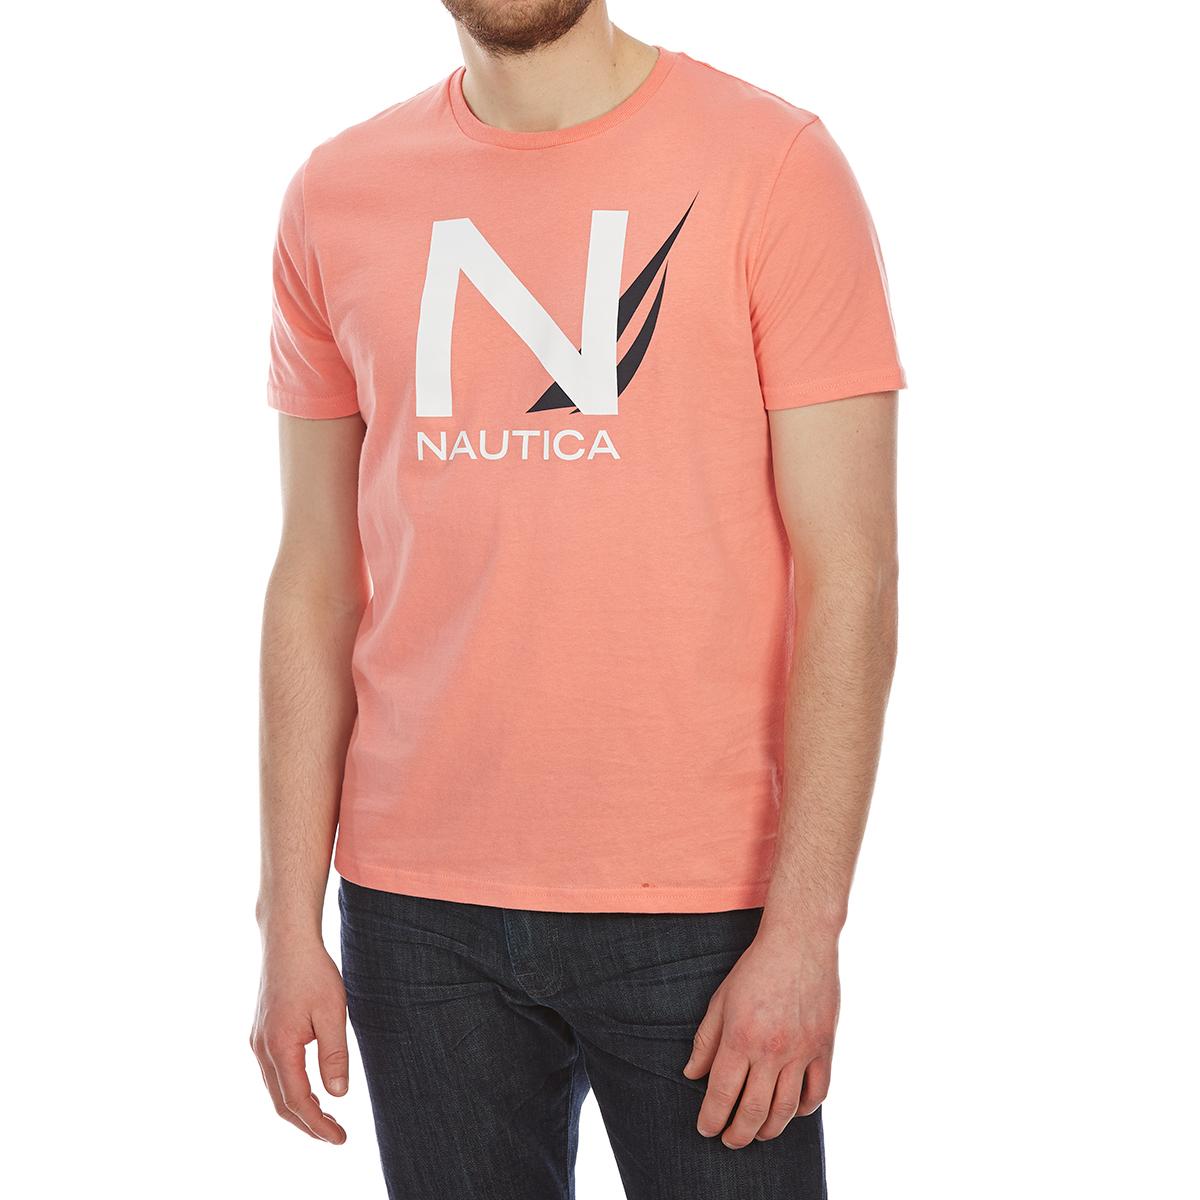 Nautica Men's Heritage Graphic Short-Sleeve Tee - Orange, XL